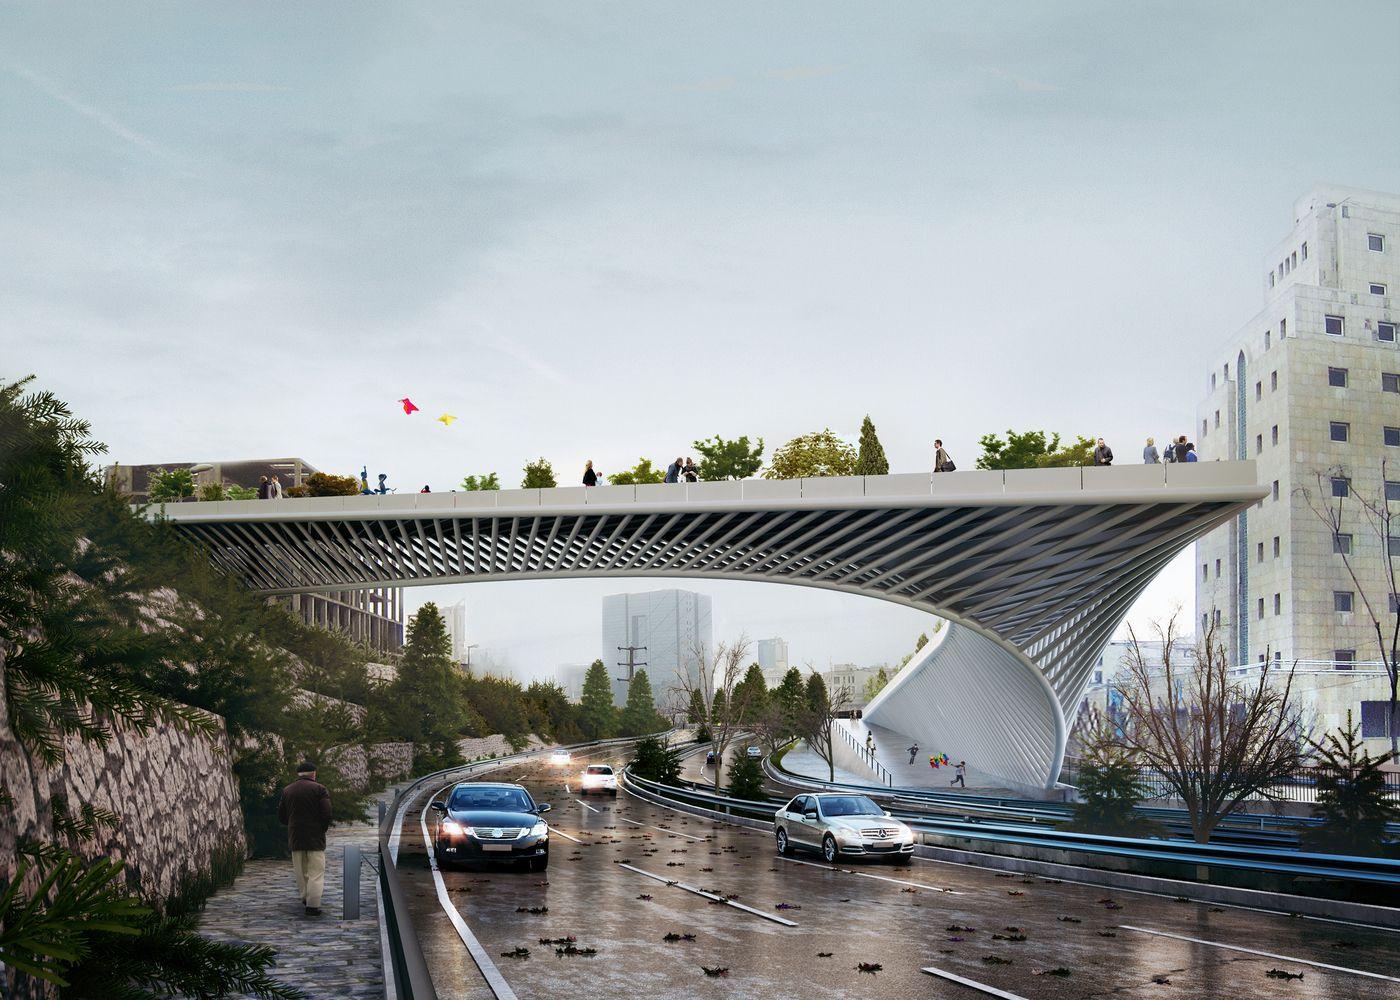 3rd Skin Architectsu0027 Haghani Pedestrian Bridge Folds